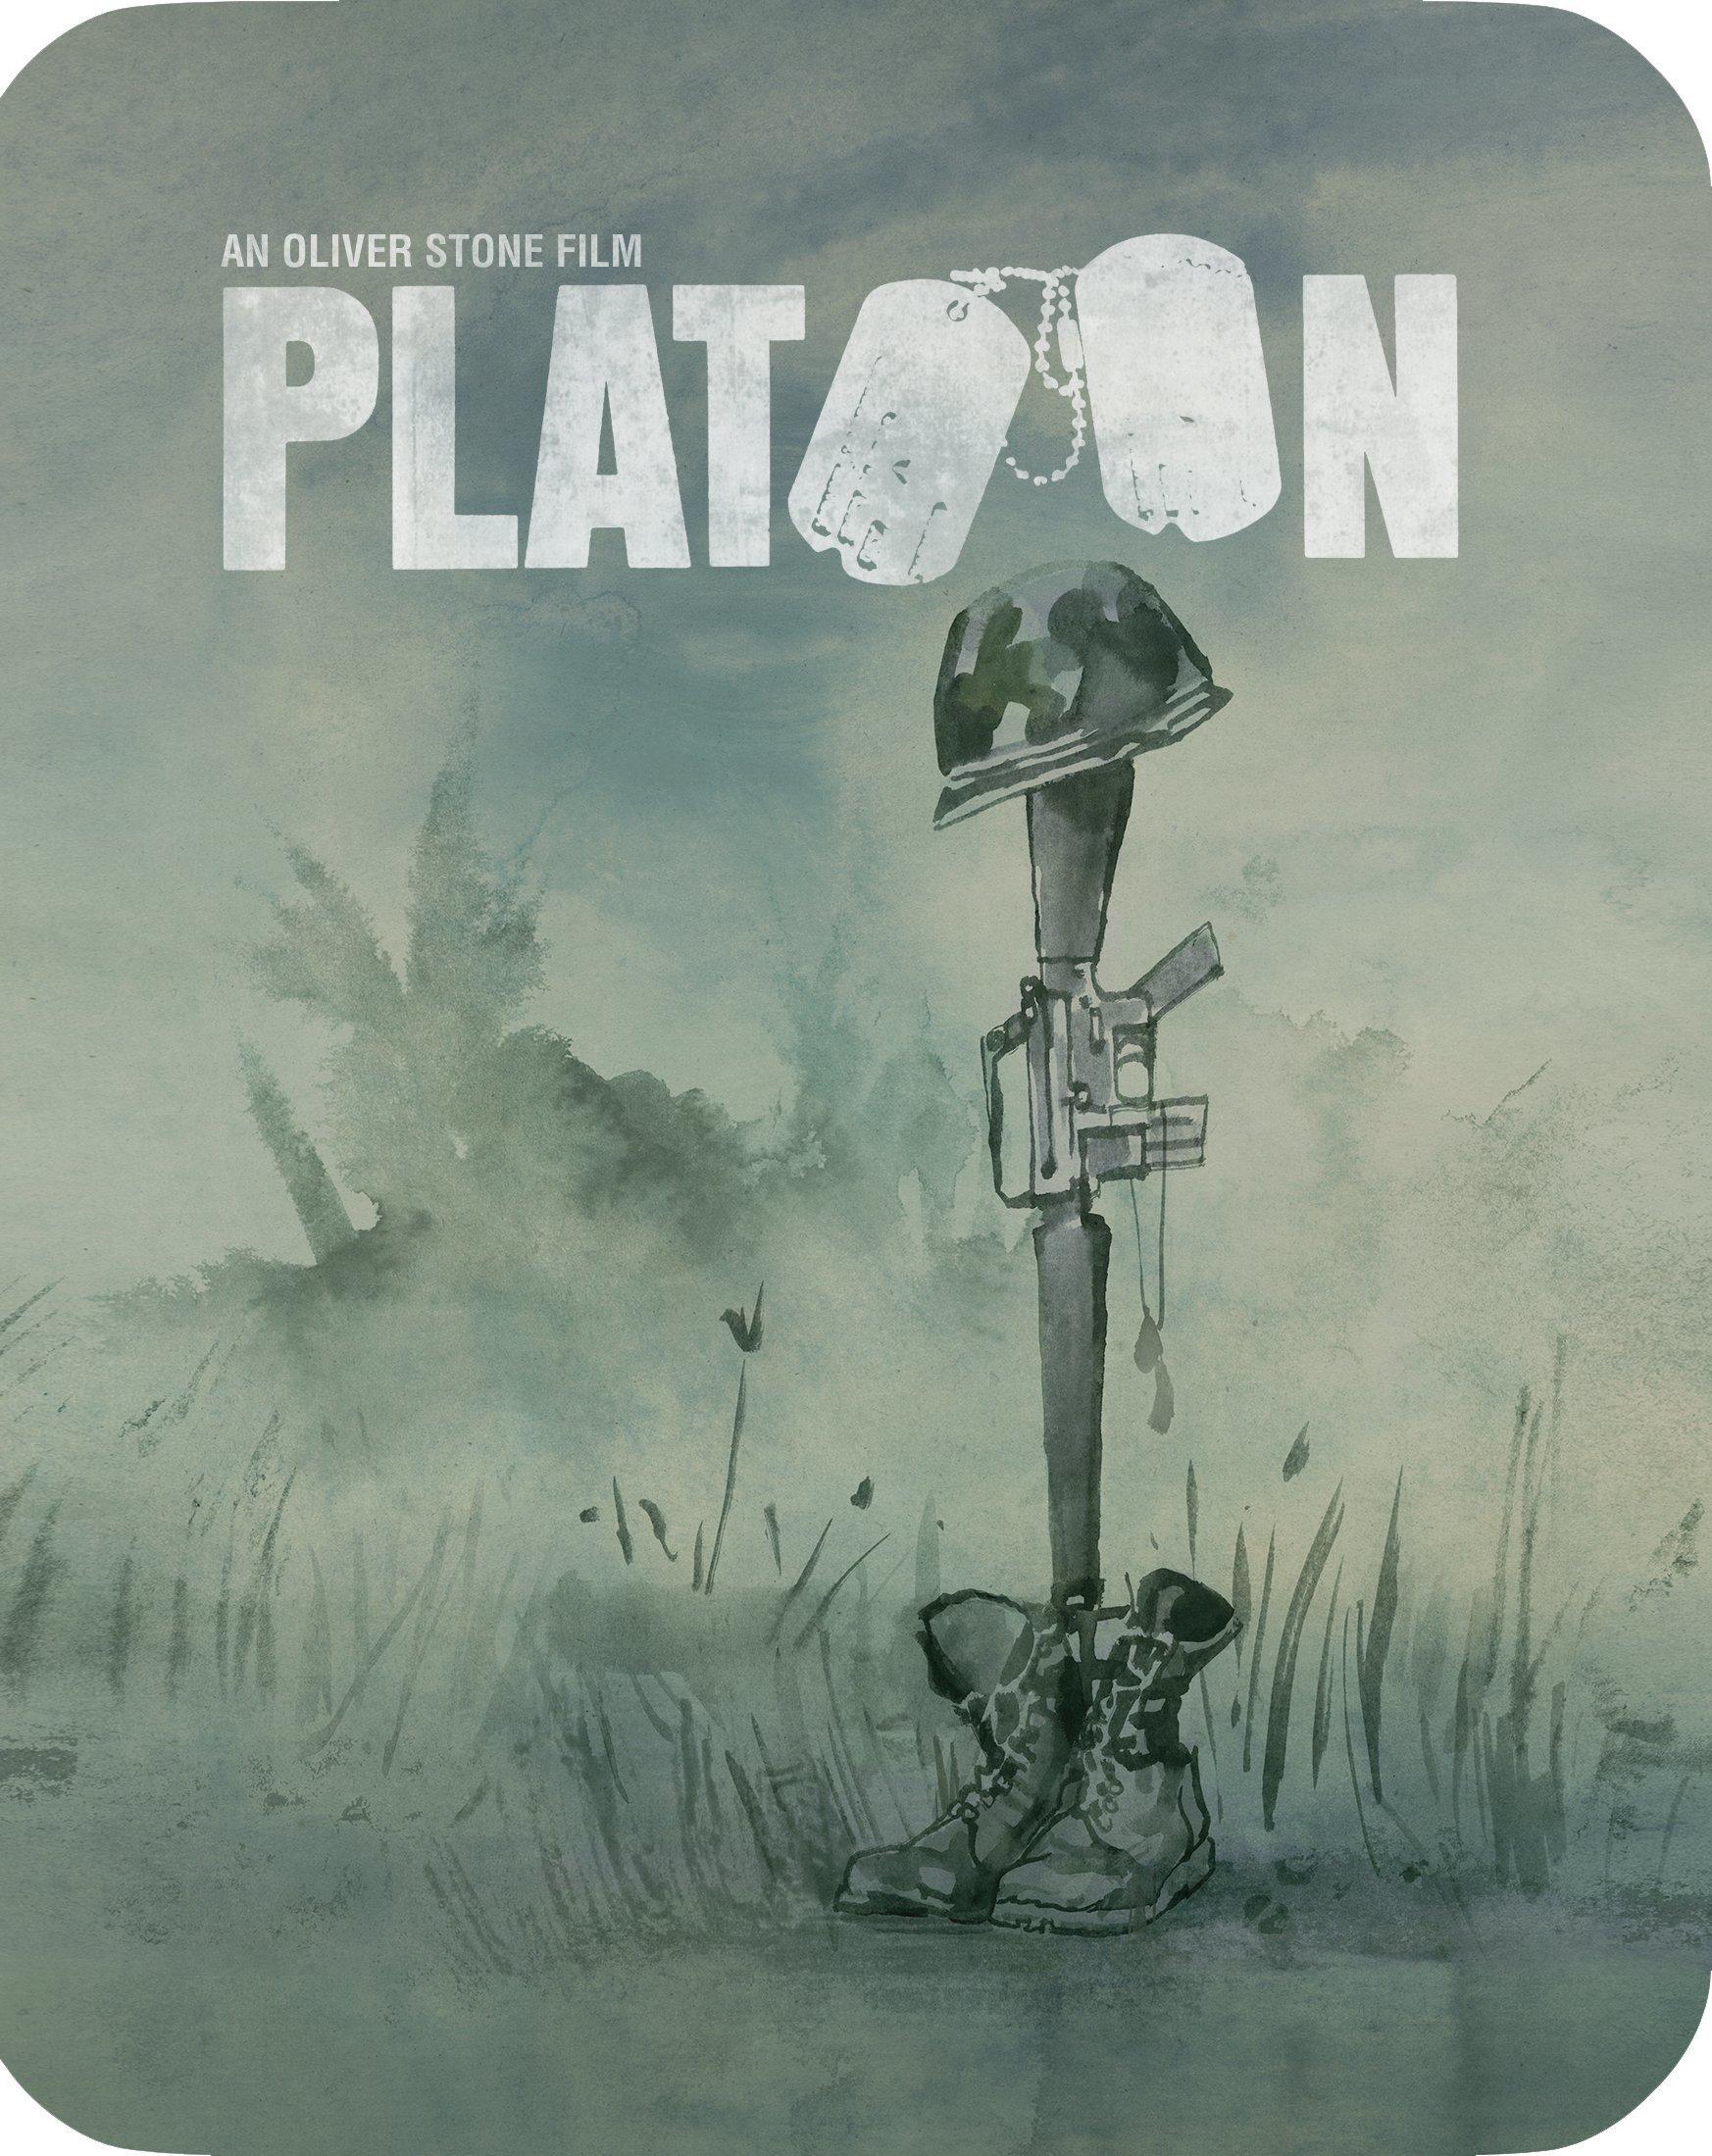 Platoon (Limited Edition Steelbook)(Blu-ray)(Region A)